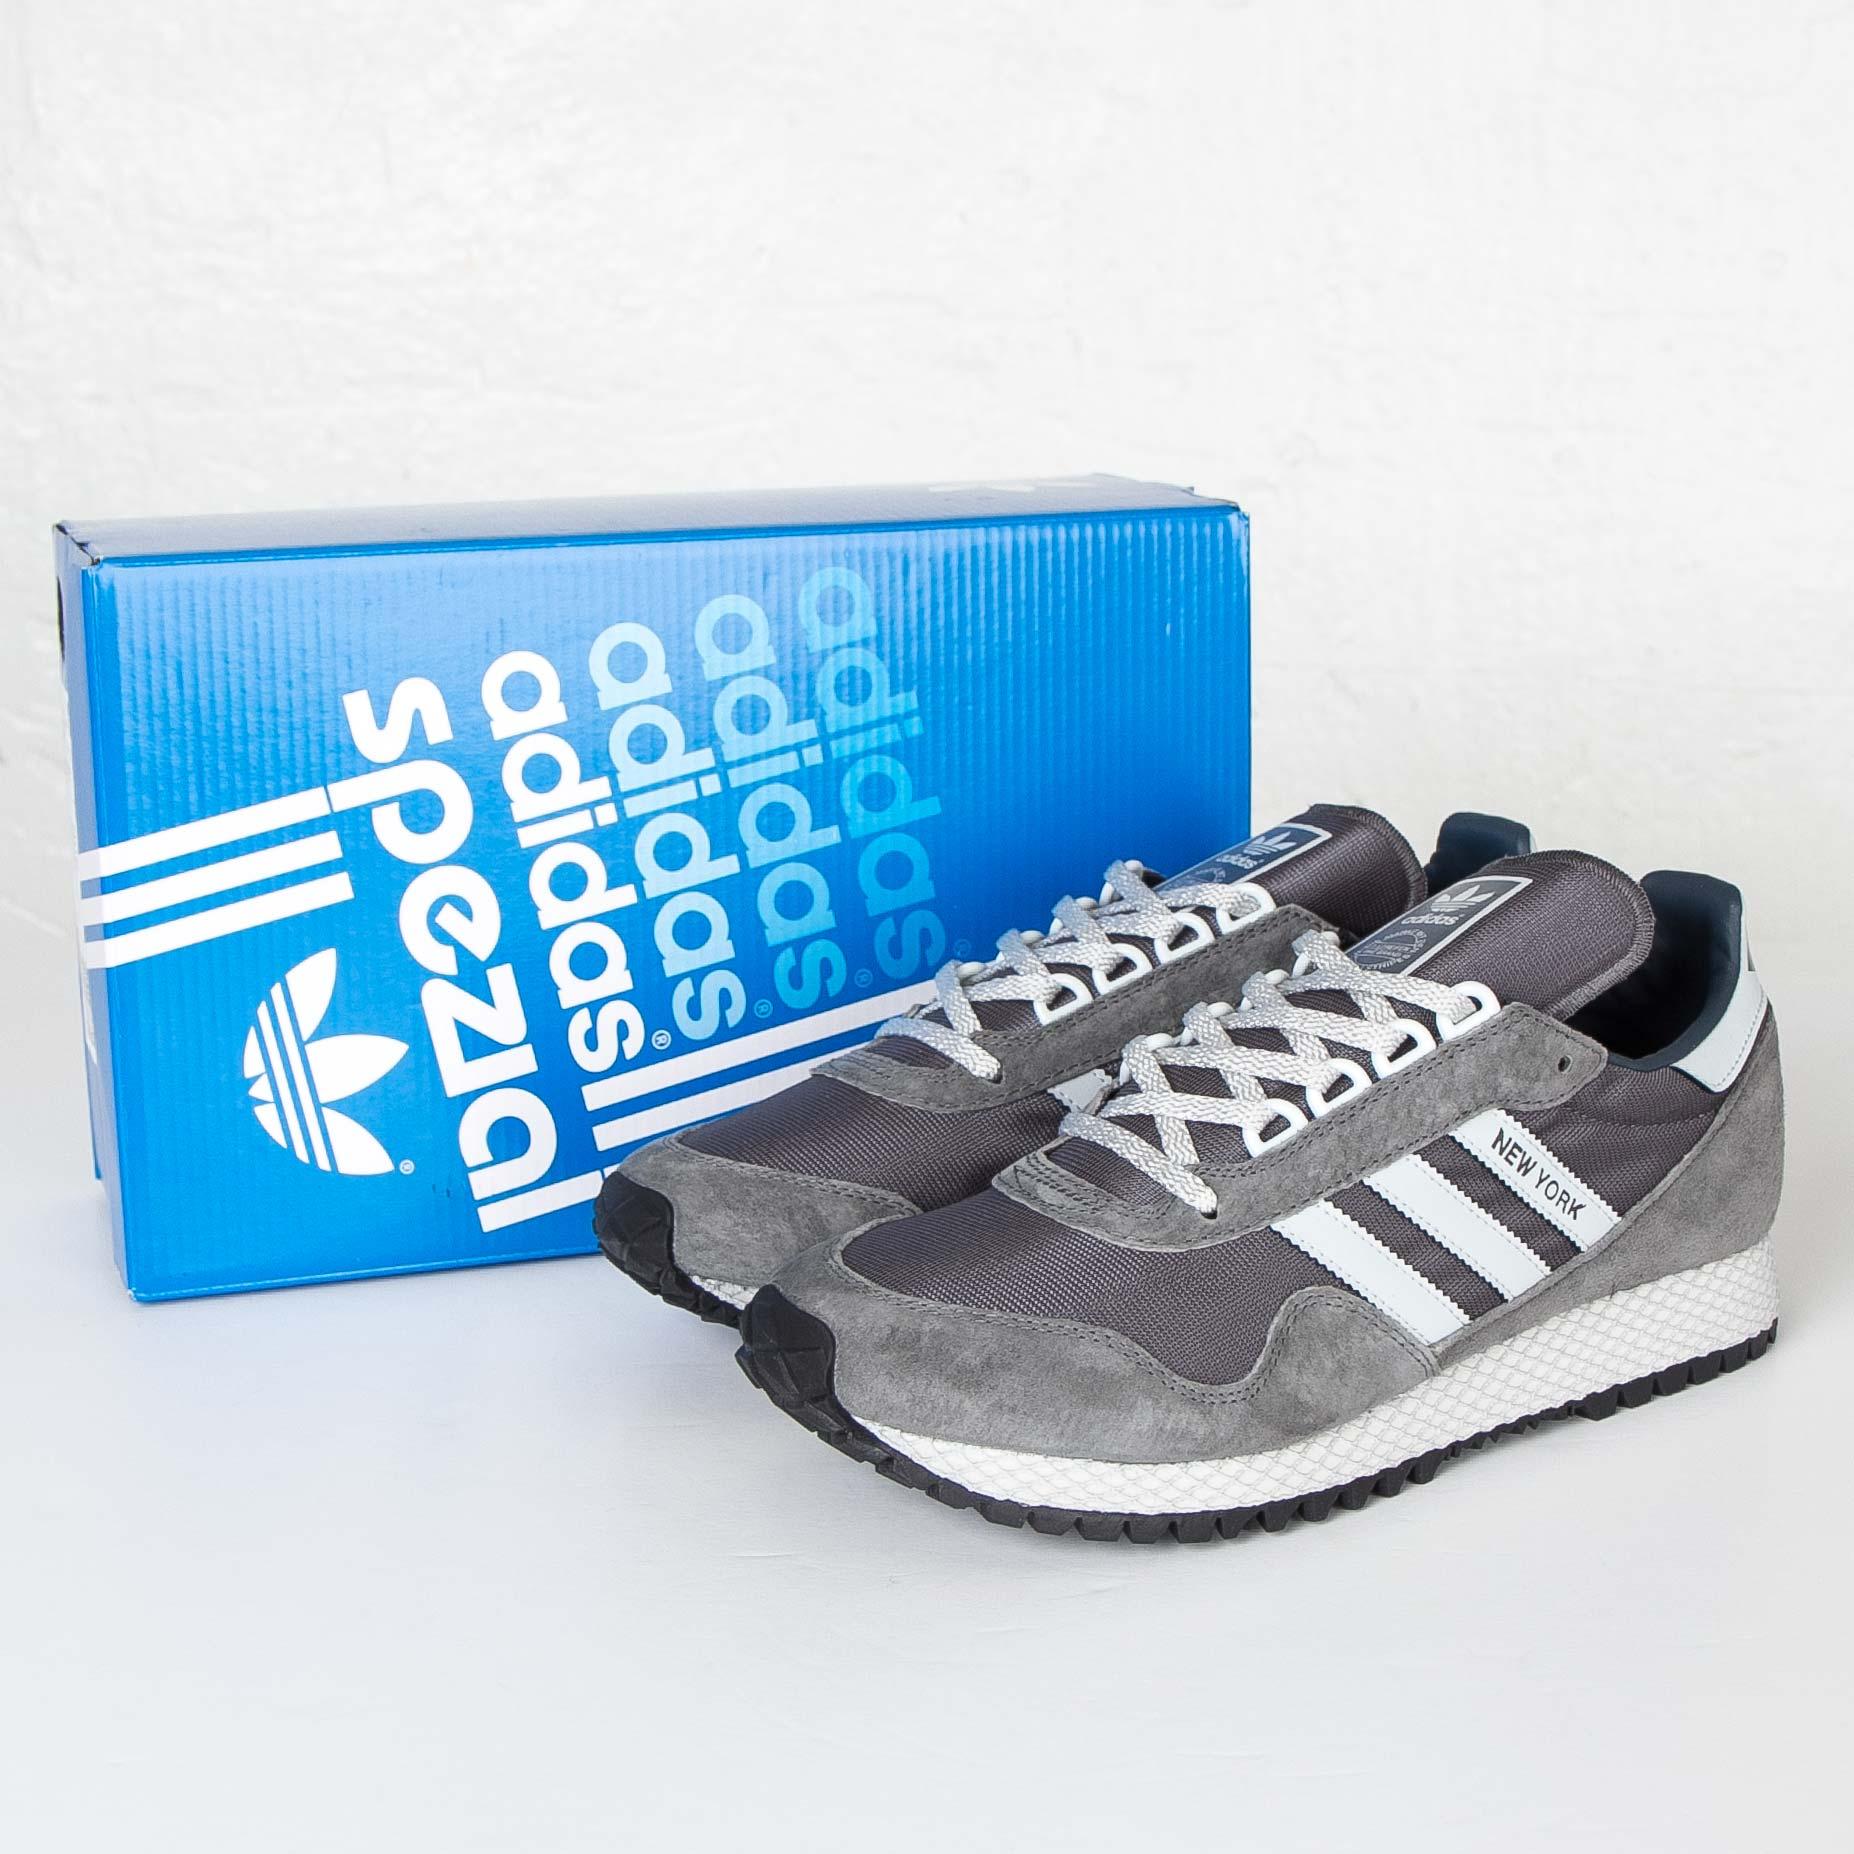 newest 98894 a7194 adidas New York SPZL - B41179 - Sneakersnstuff   sneakers   streetwear  online since 1999